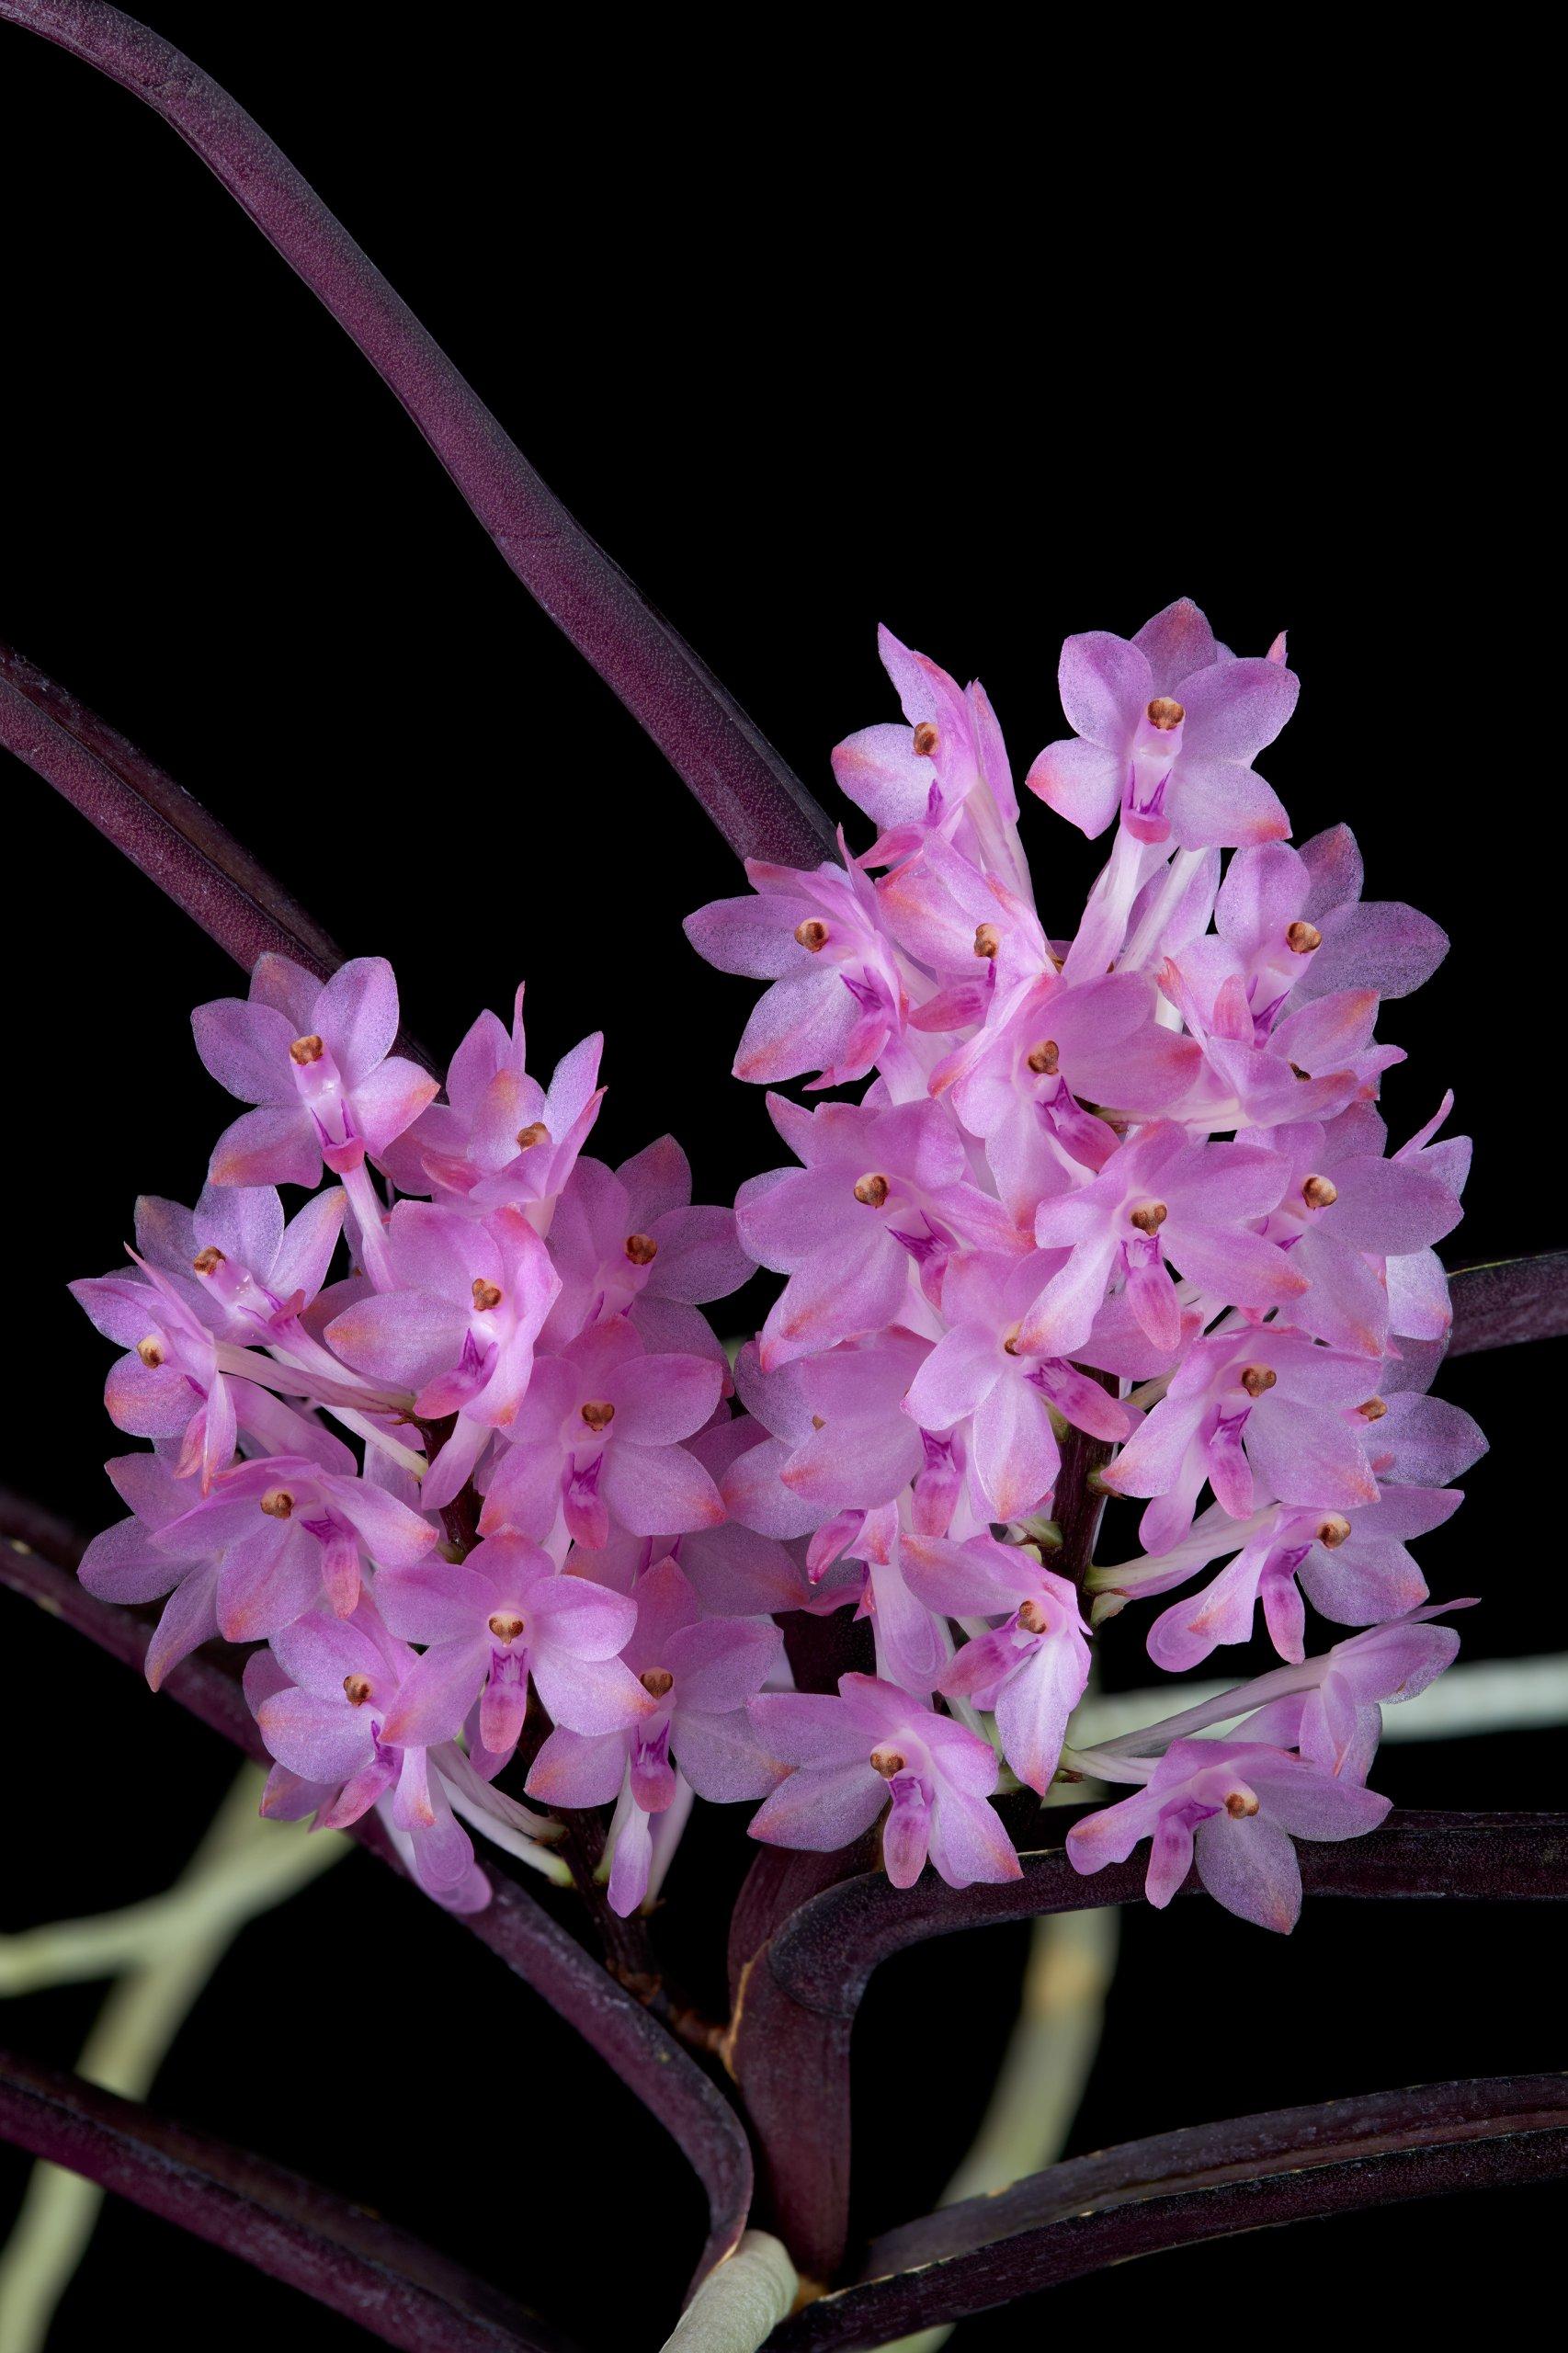 Ascocentrum christensonianum flowers_01.jpg